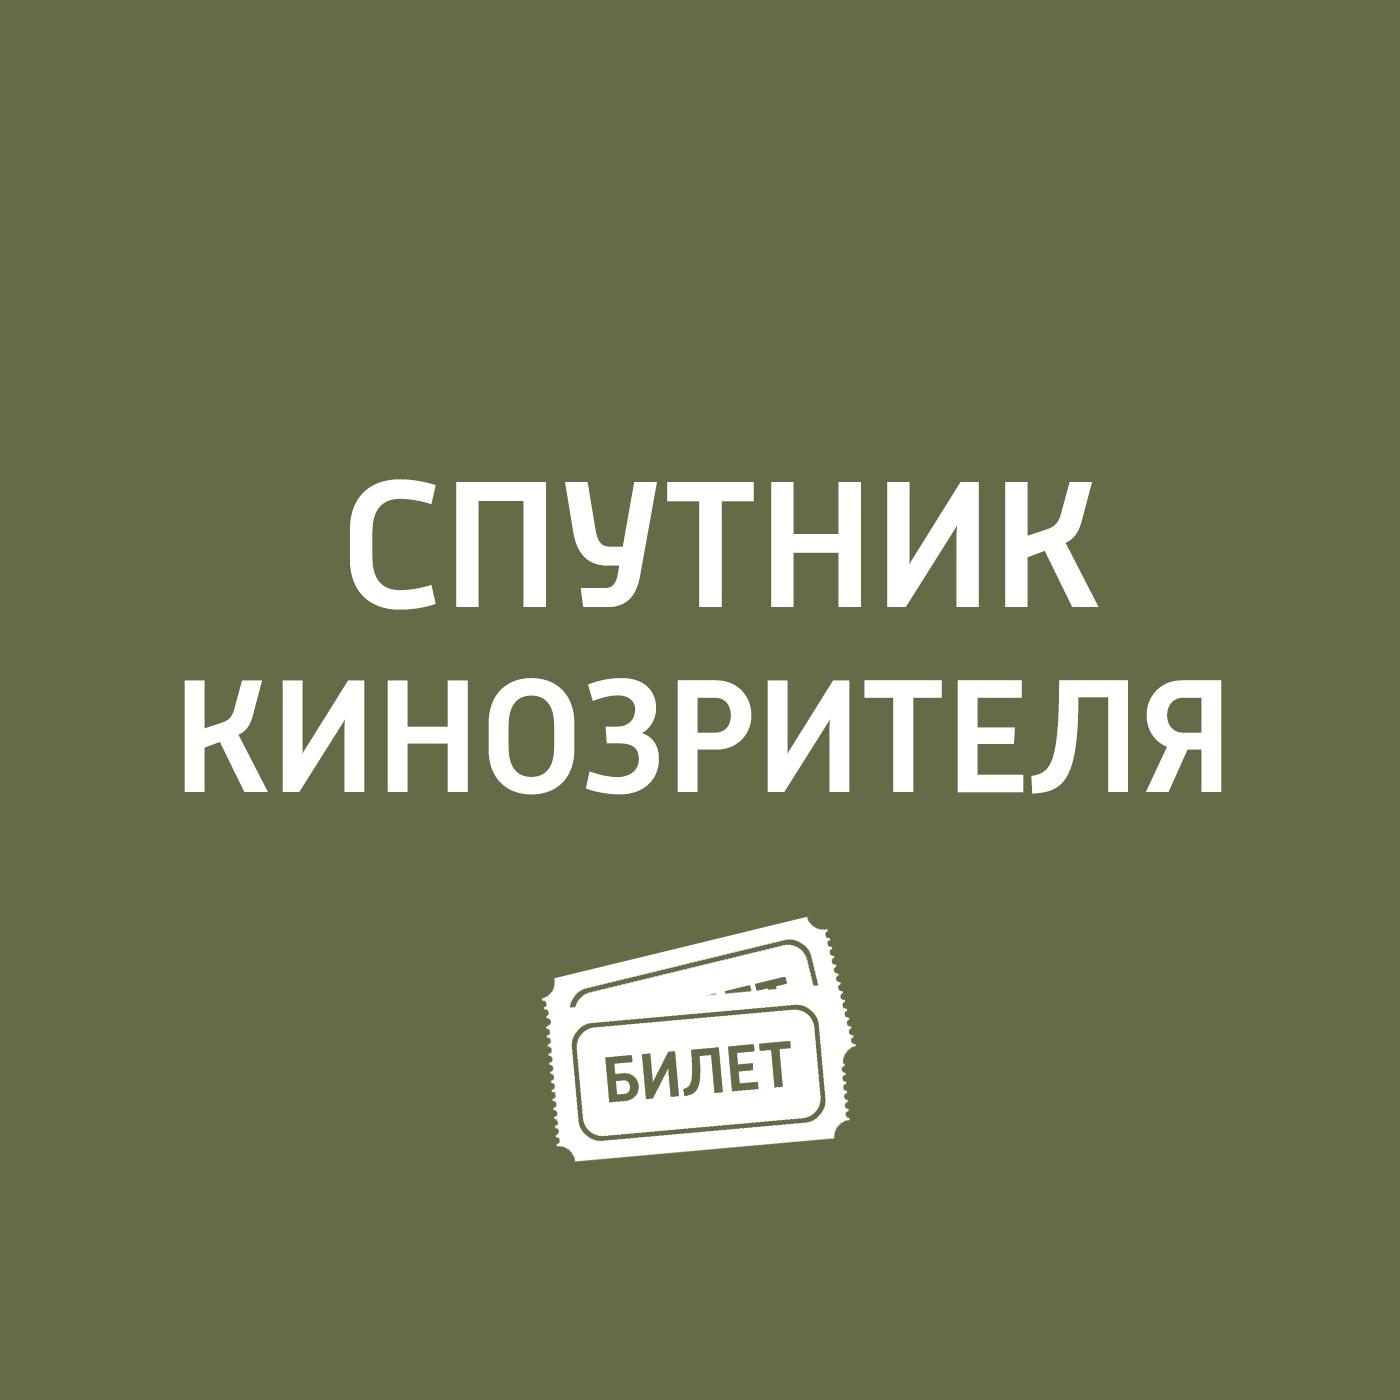 Вспоминаем кинотворчество Романа Карцева и Шарля Азнавура